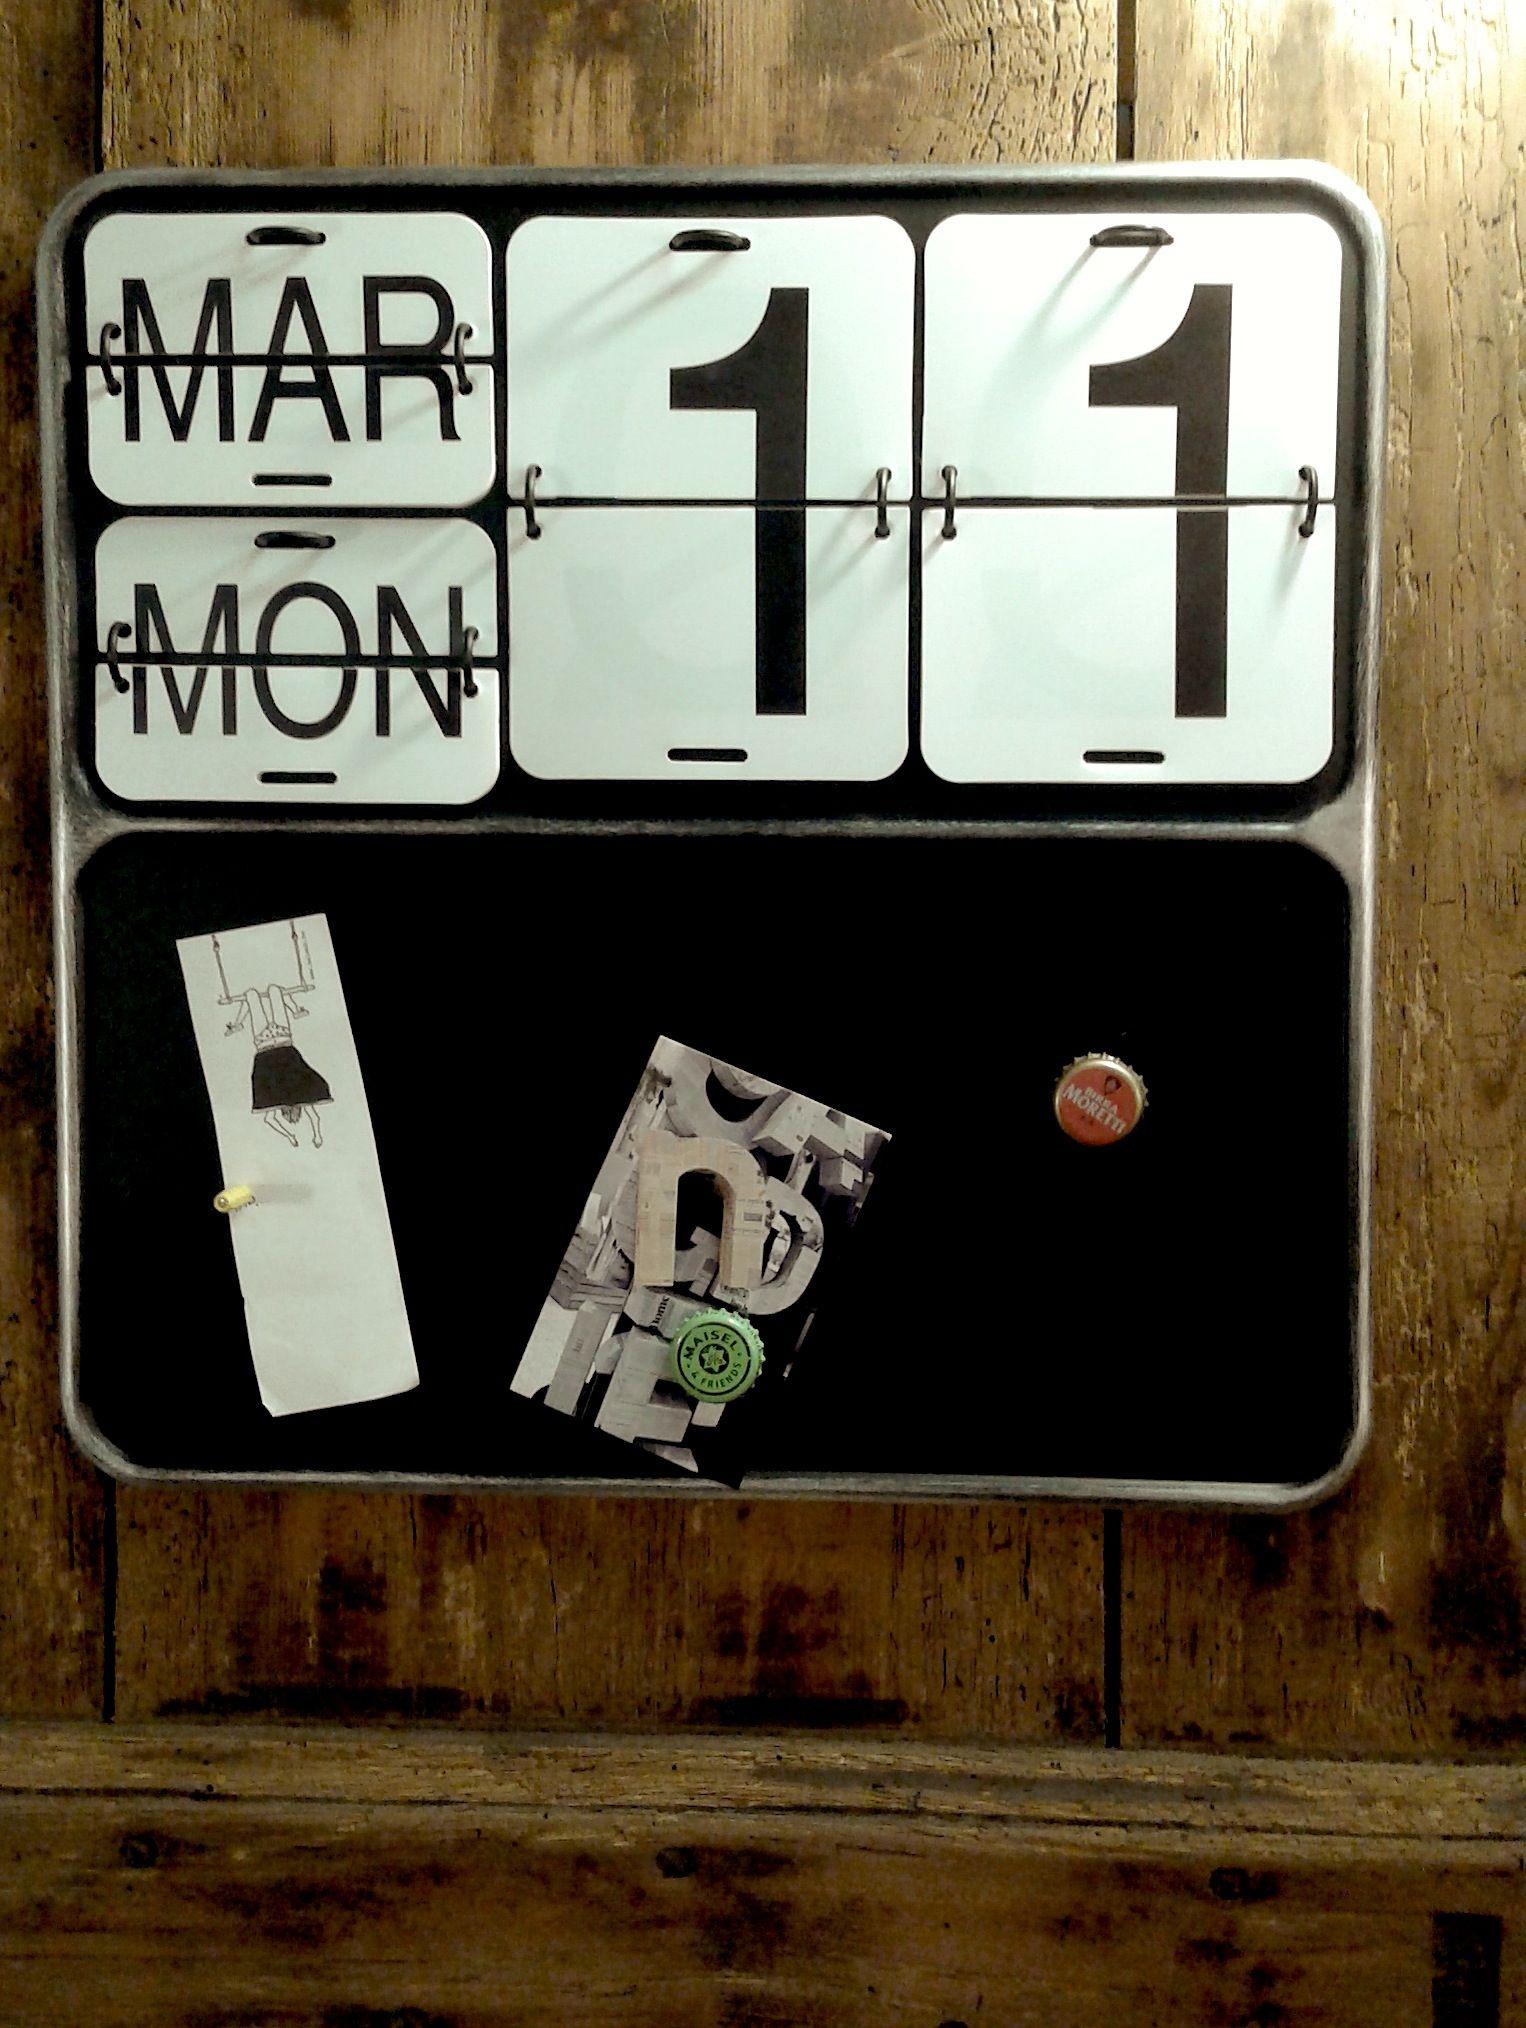 Calendario Perpetuo Da Parete.Calendario Da Parete Cm 40x40 Con Lavagna Magnetica